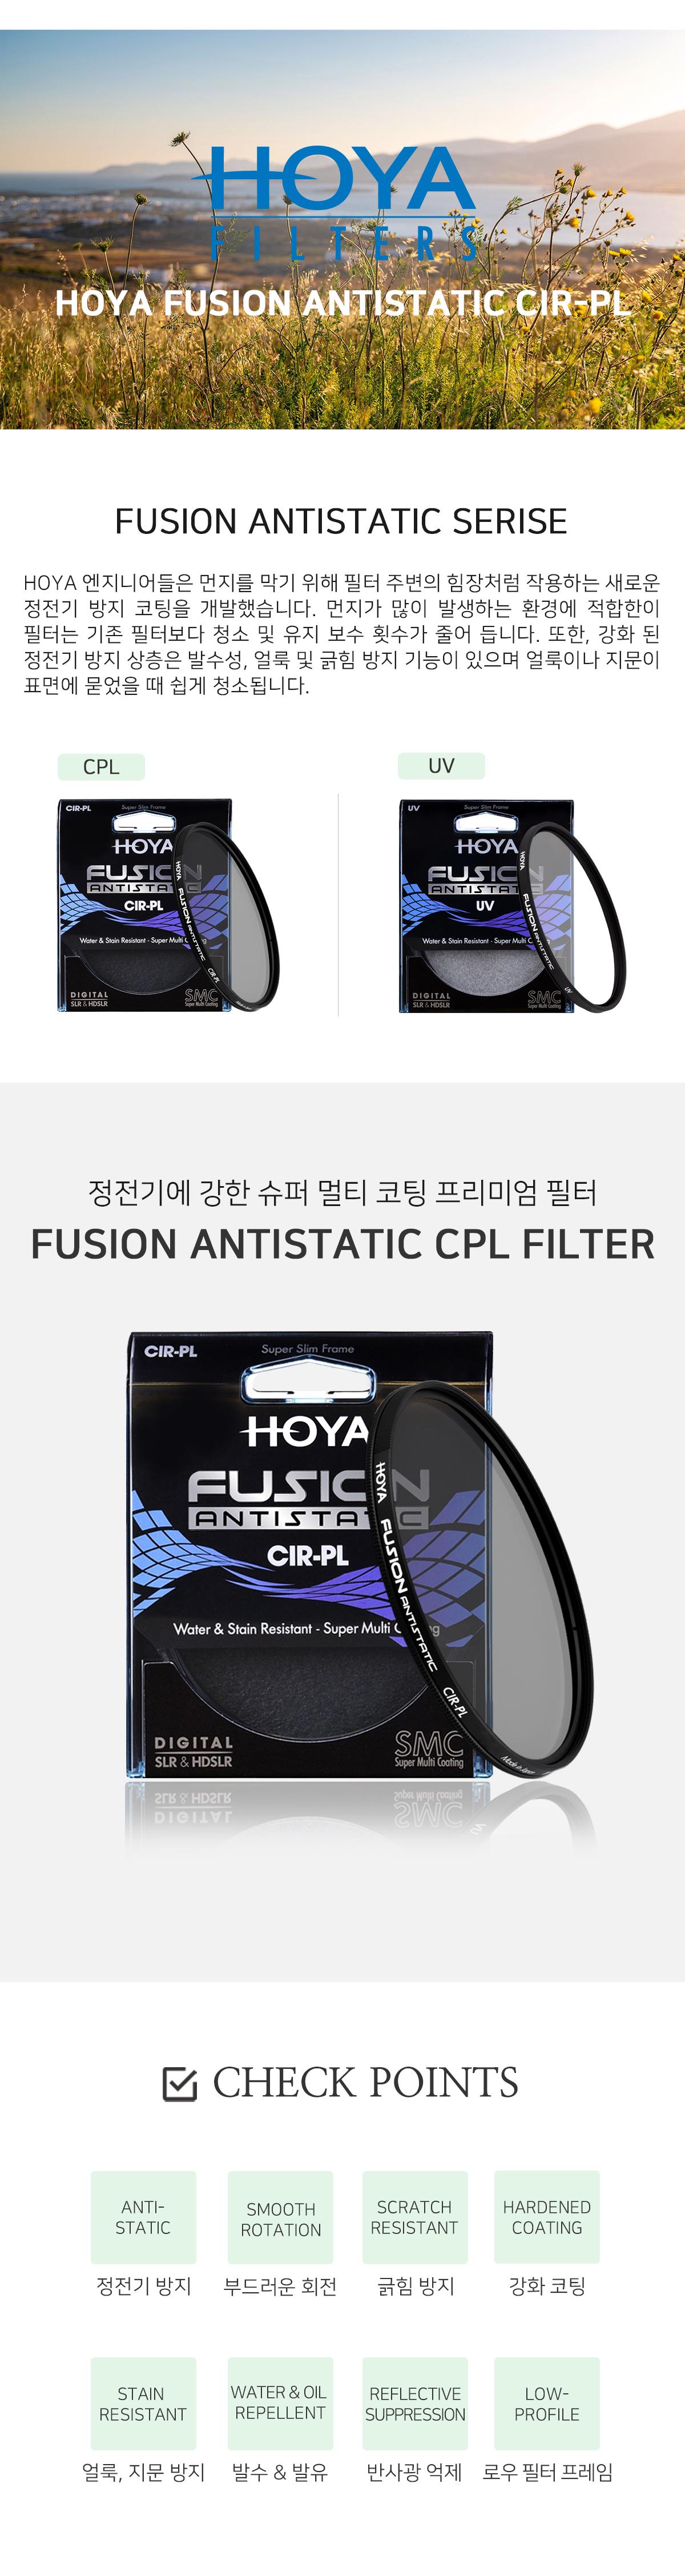 FUSION_ANTISTATIC_CPL_01.jpg